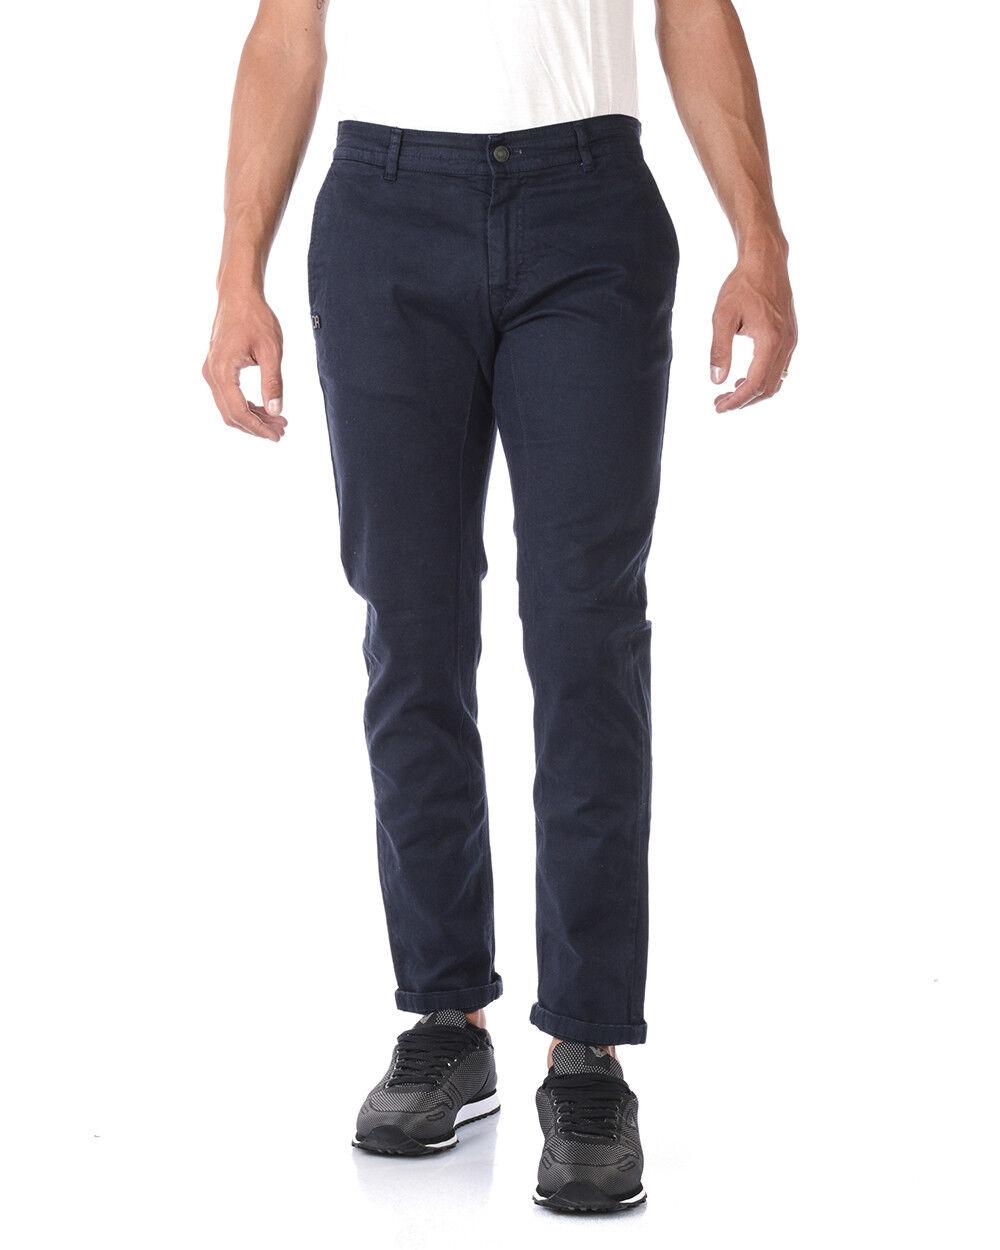 Jeans Daniele Alessandrini Jeans Cotone men blue PJ9001L1003735 23